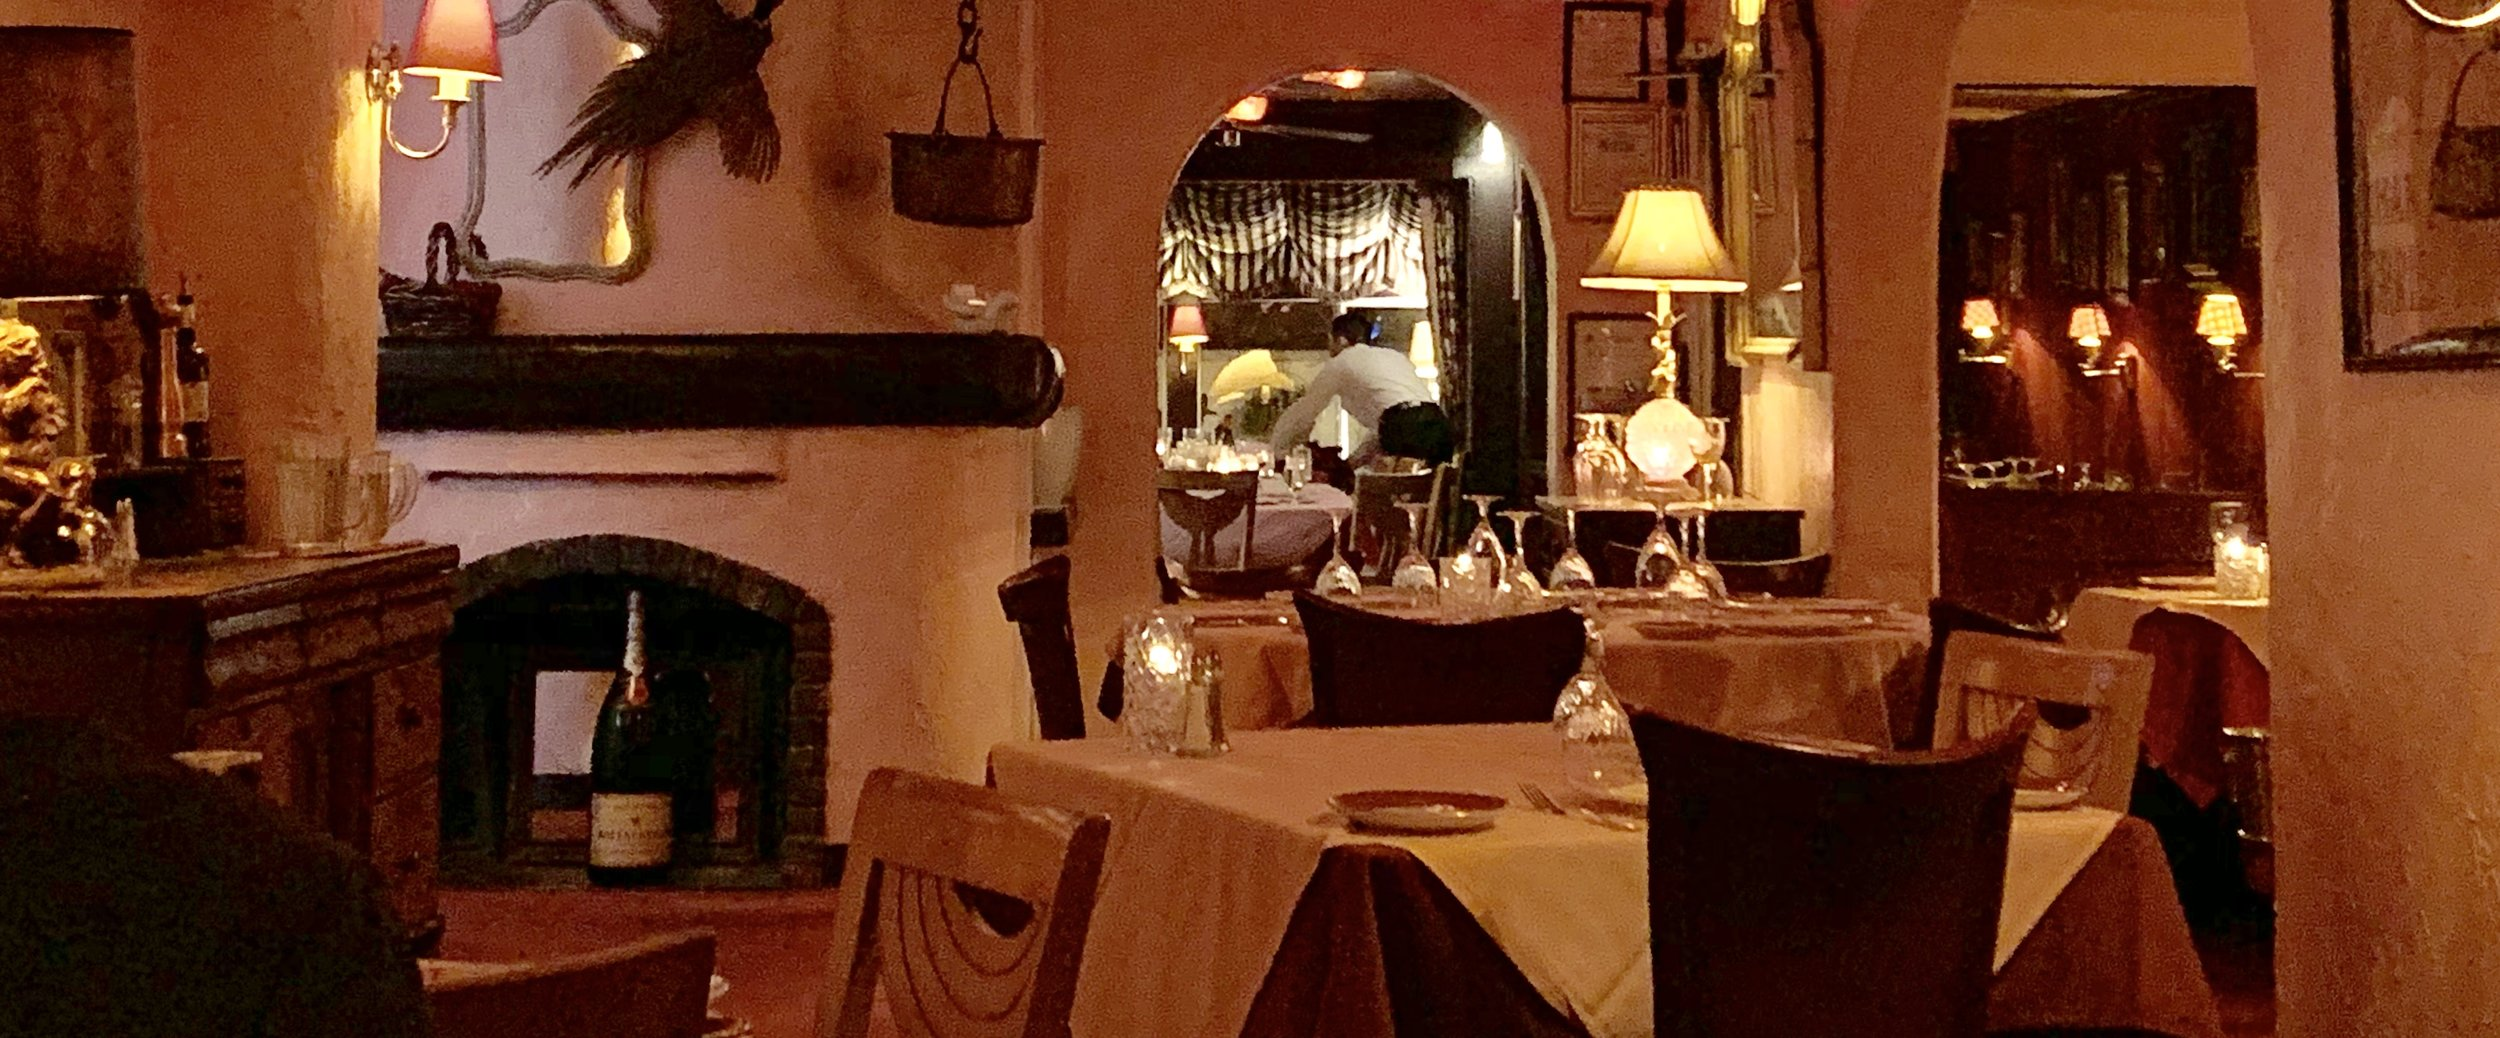 intimate cozy dining